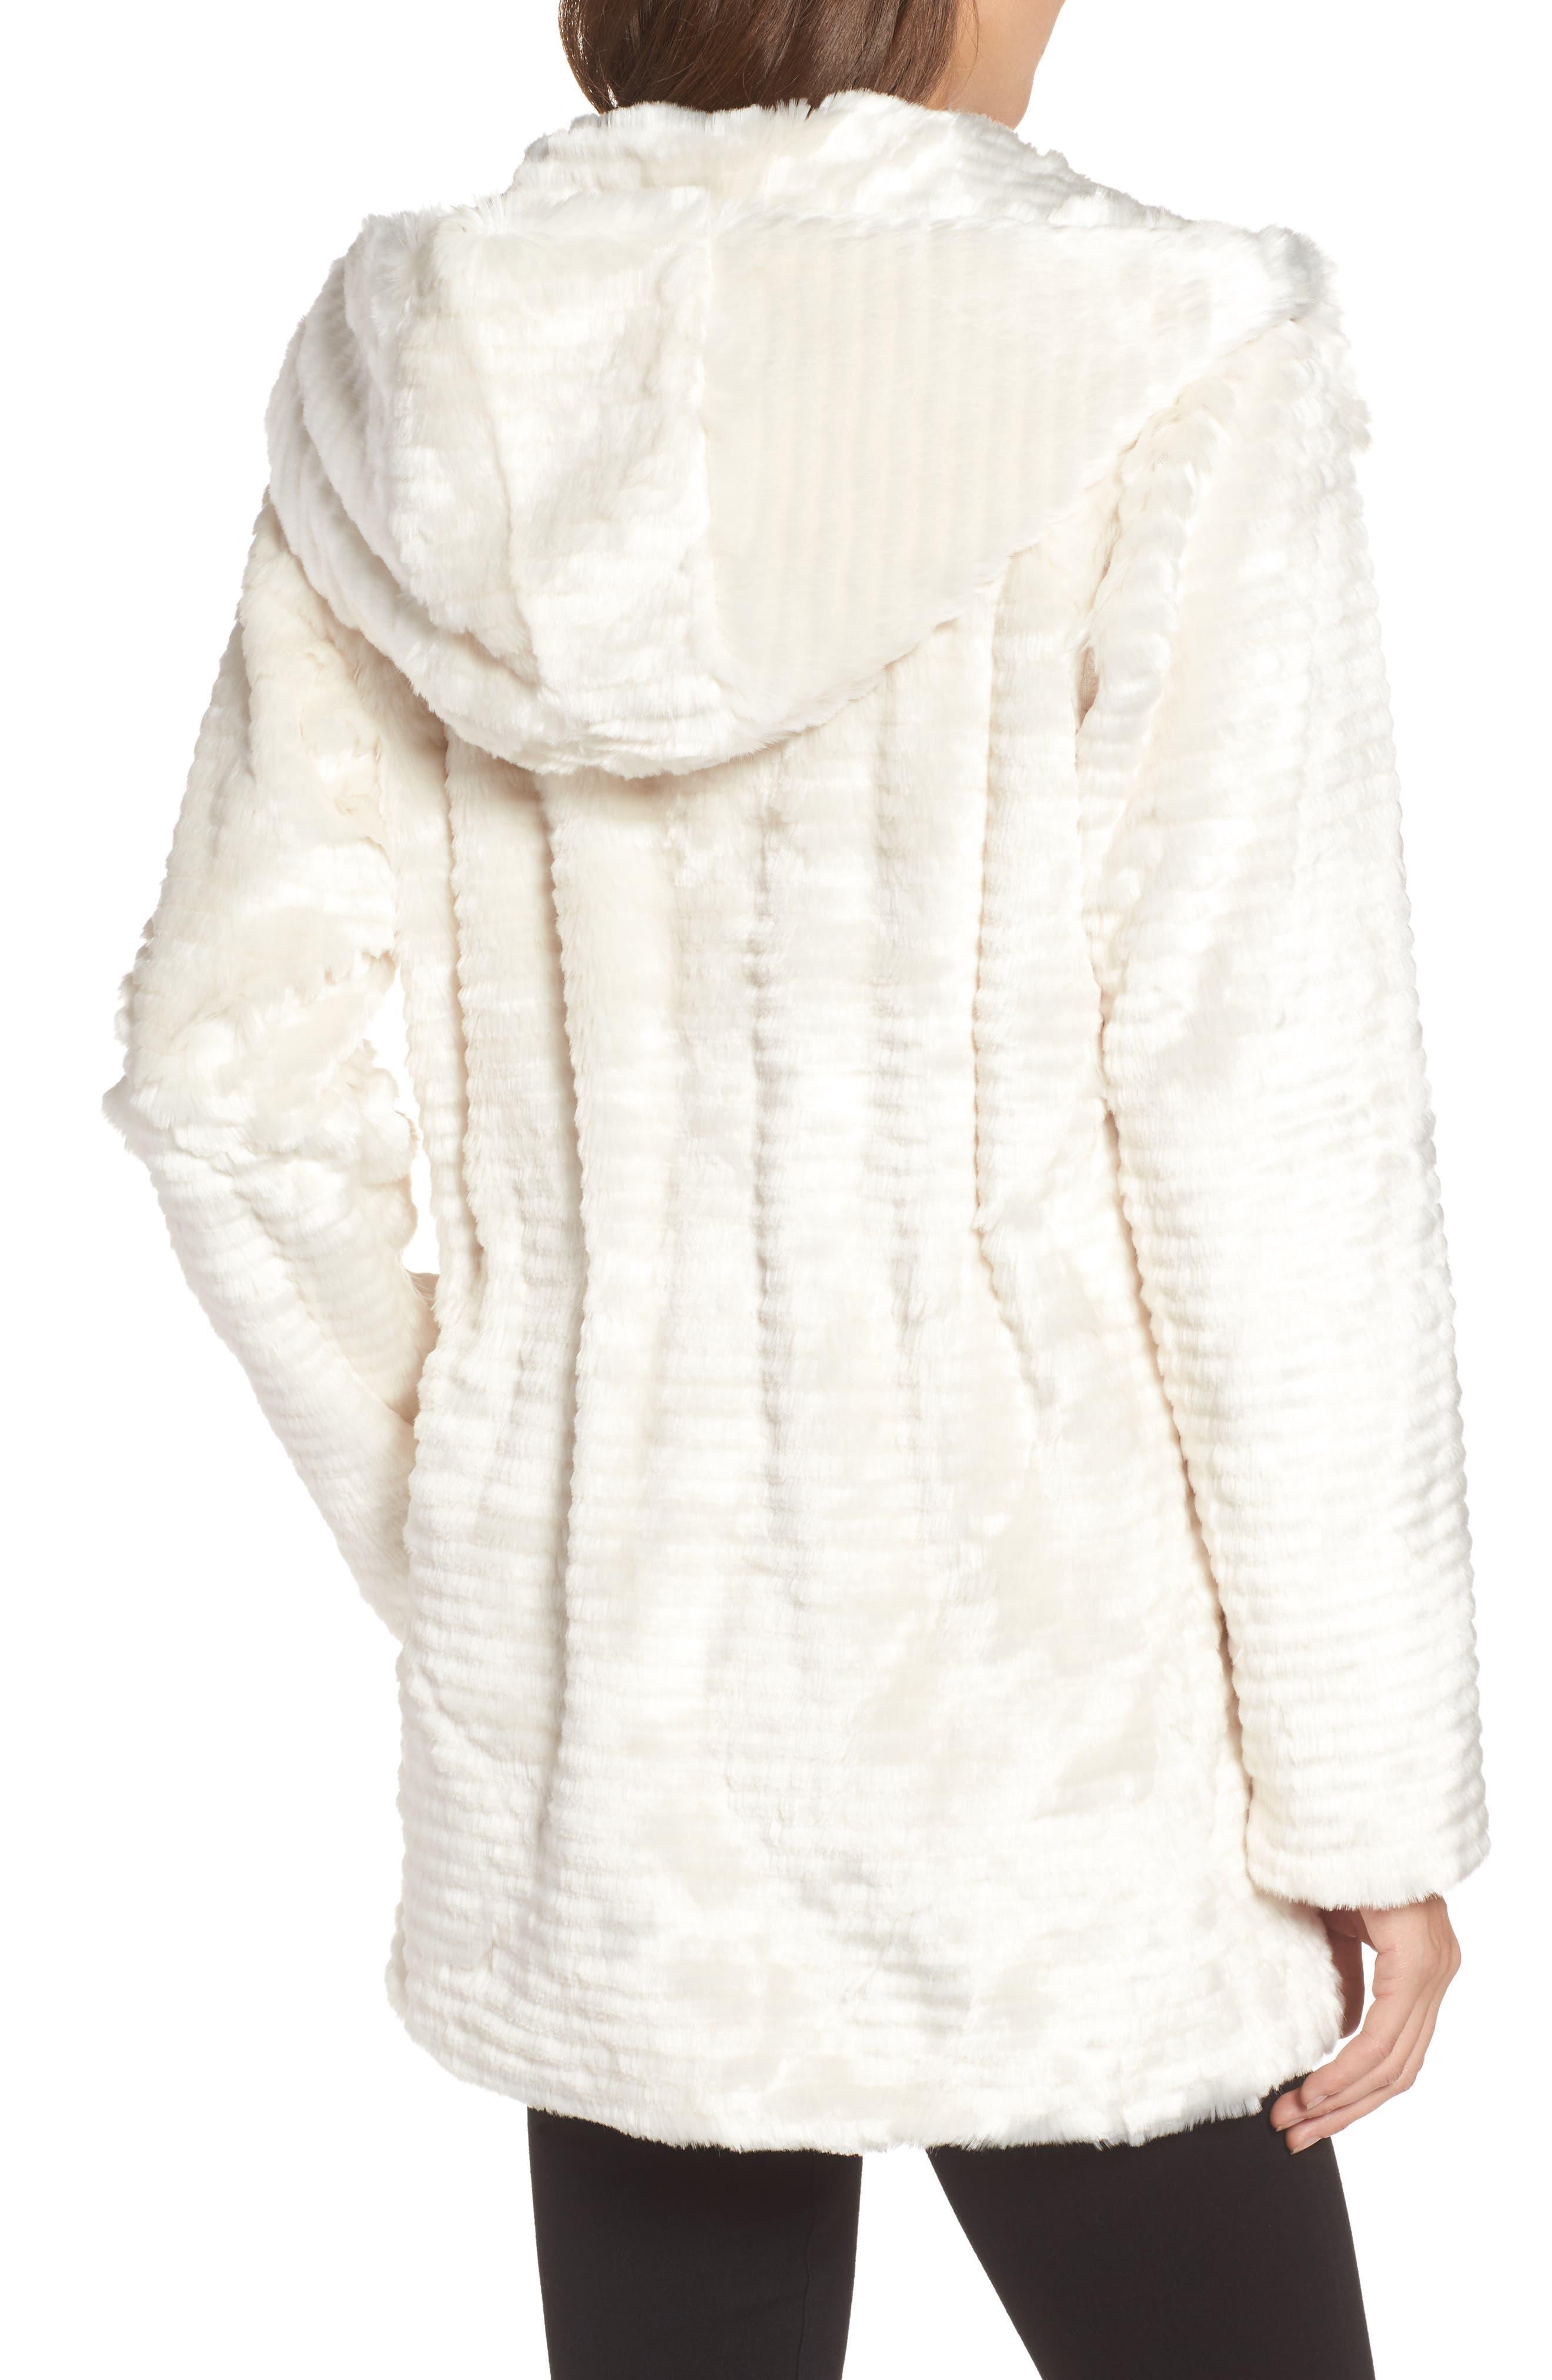 VINCE CAMUTO,                             Hooded Faux Fur Coat,                             Alternate thumbnail 2, color,                             100